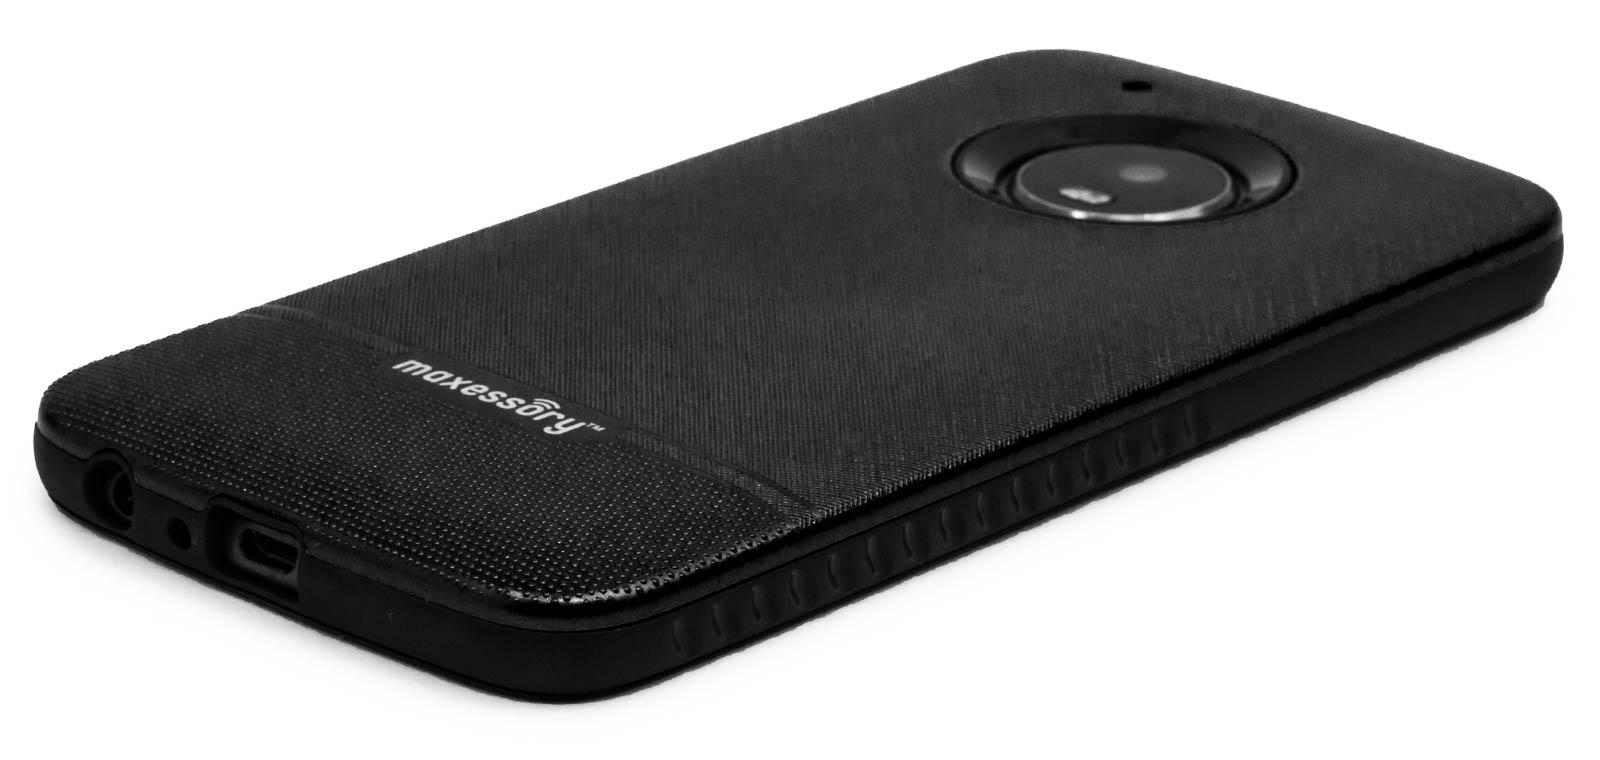 Moto-G5-Plus-Case-Moto-X-17-Case-Ultra-Thin-Hard-Body-Tactile-Shell-Cover thumbnail 5